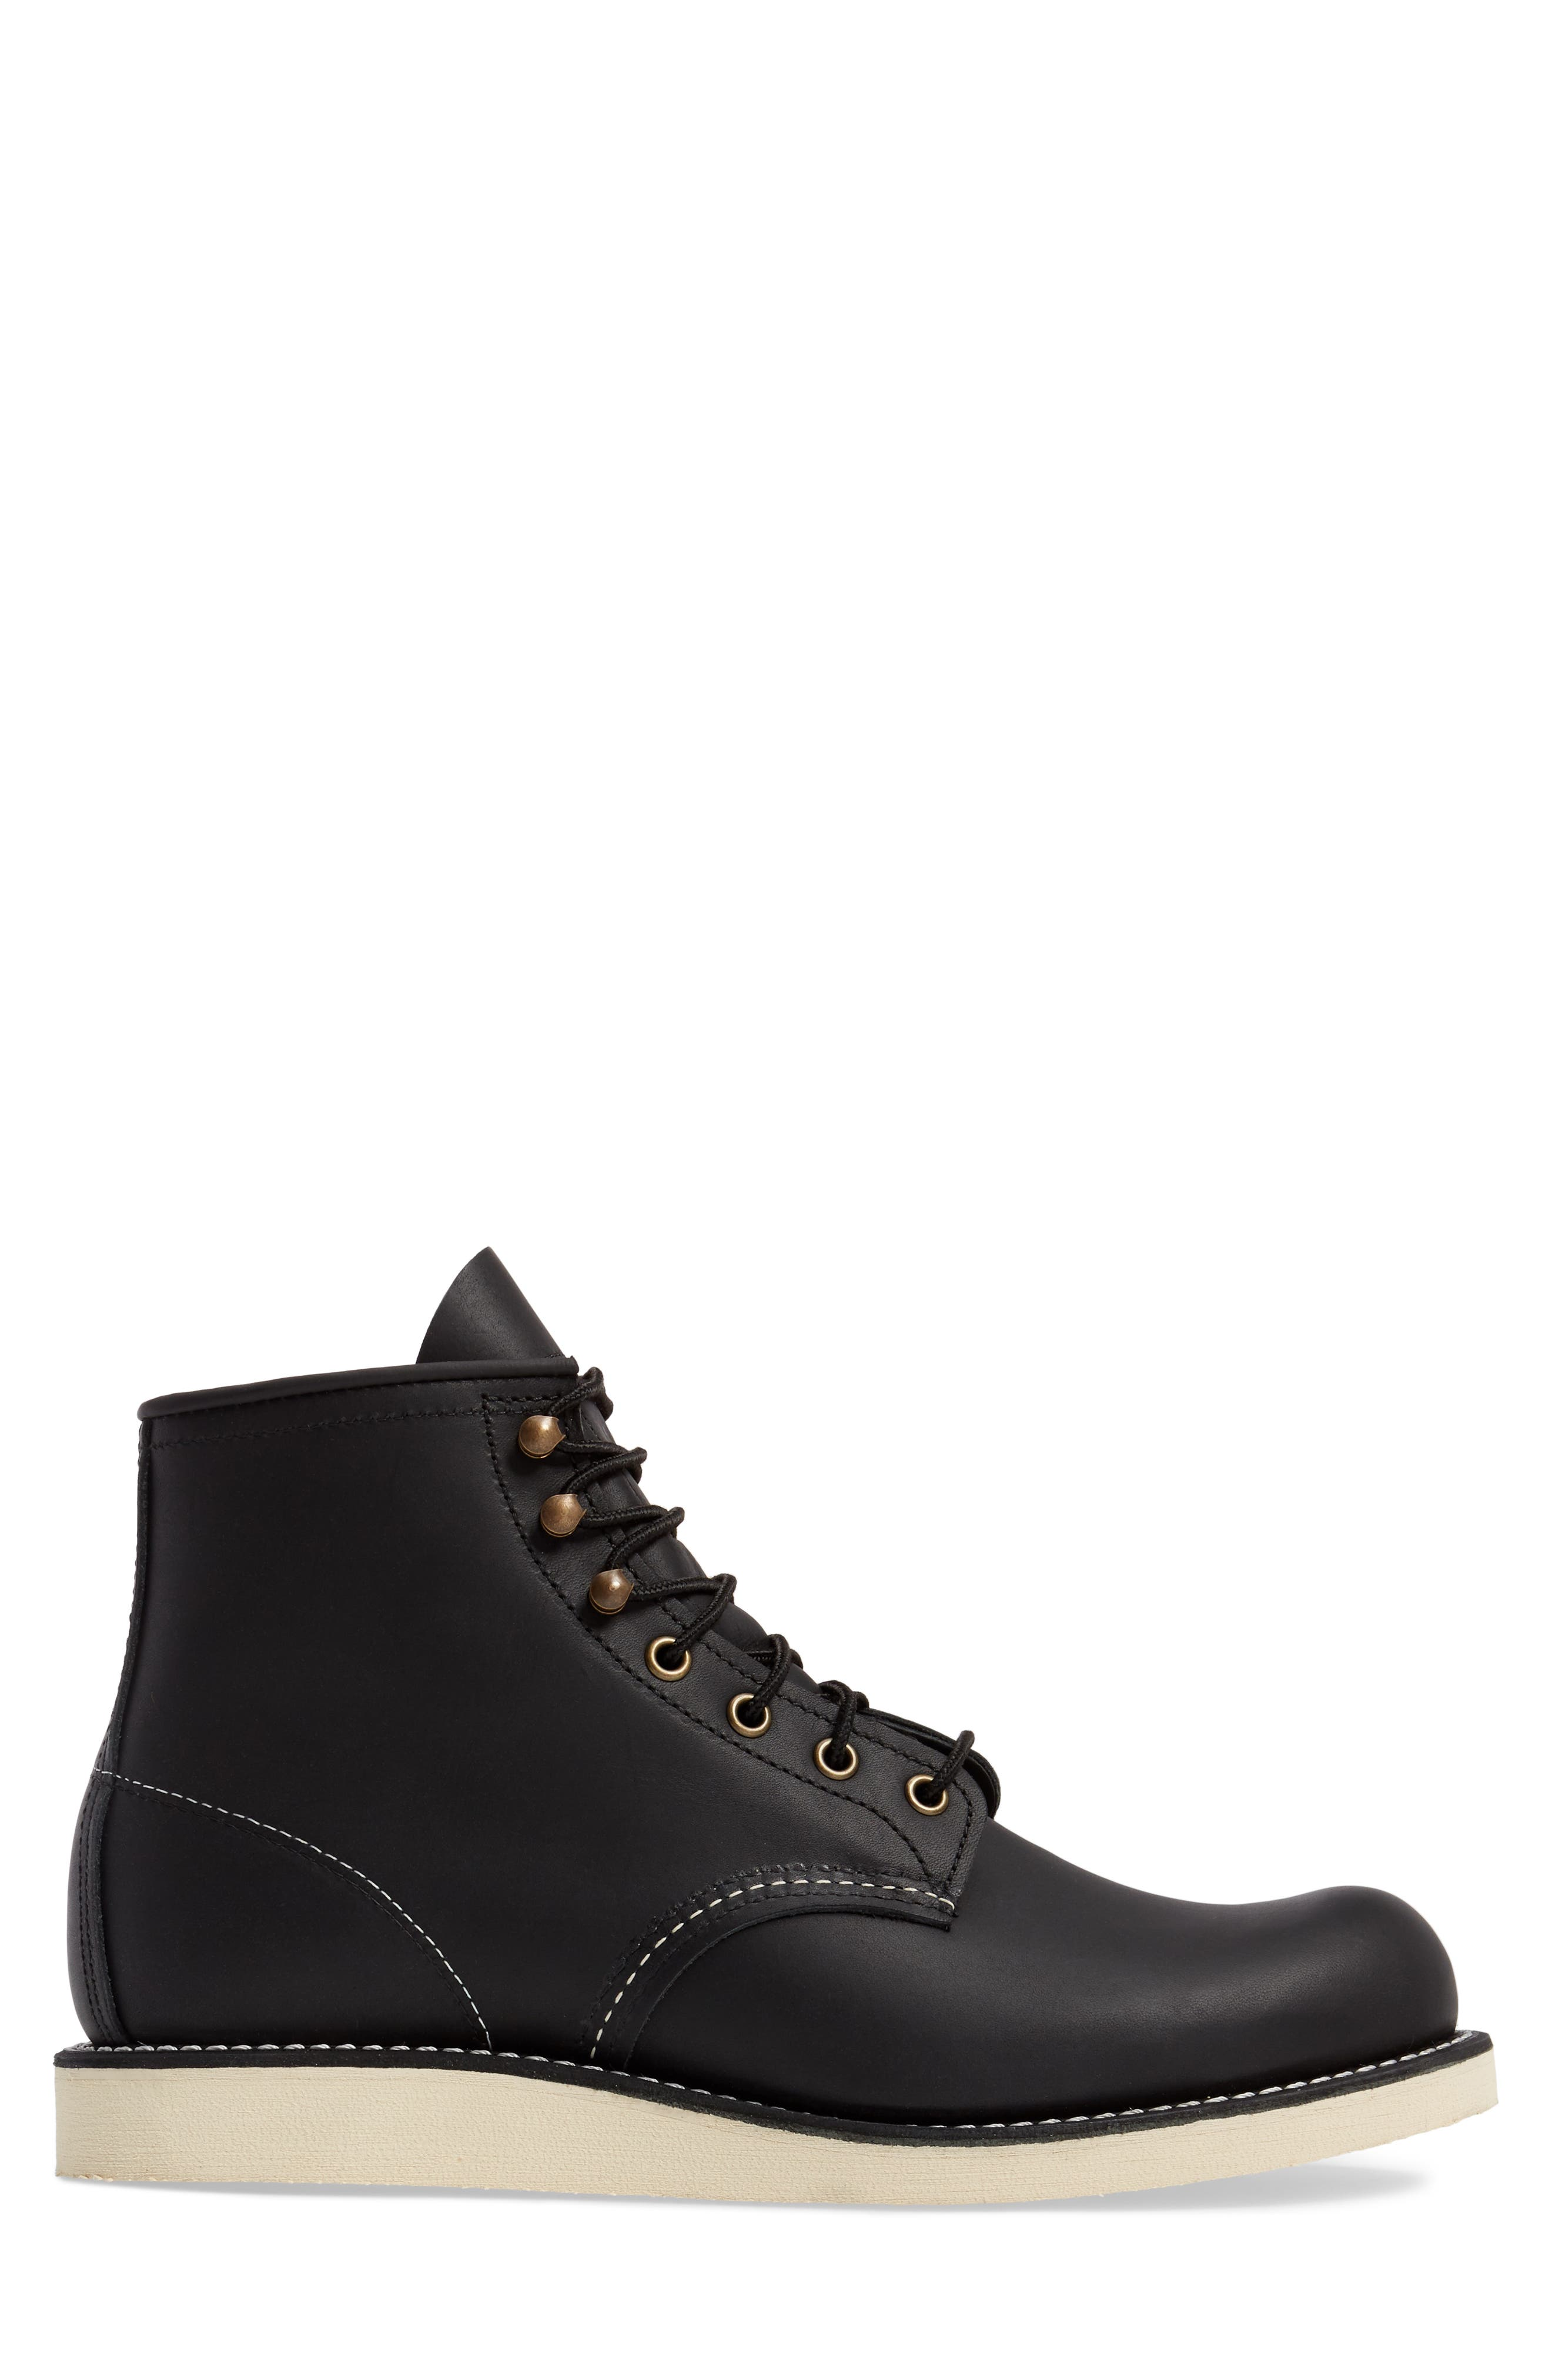 Rover Plain Toe Boot,                             Alternate thumbnail 3, color,                             Black Harness Leather